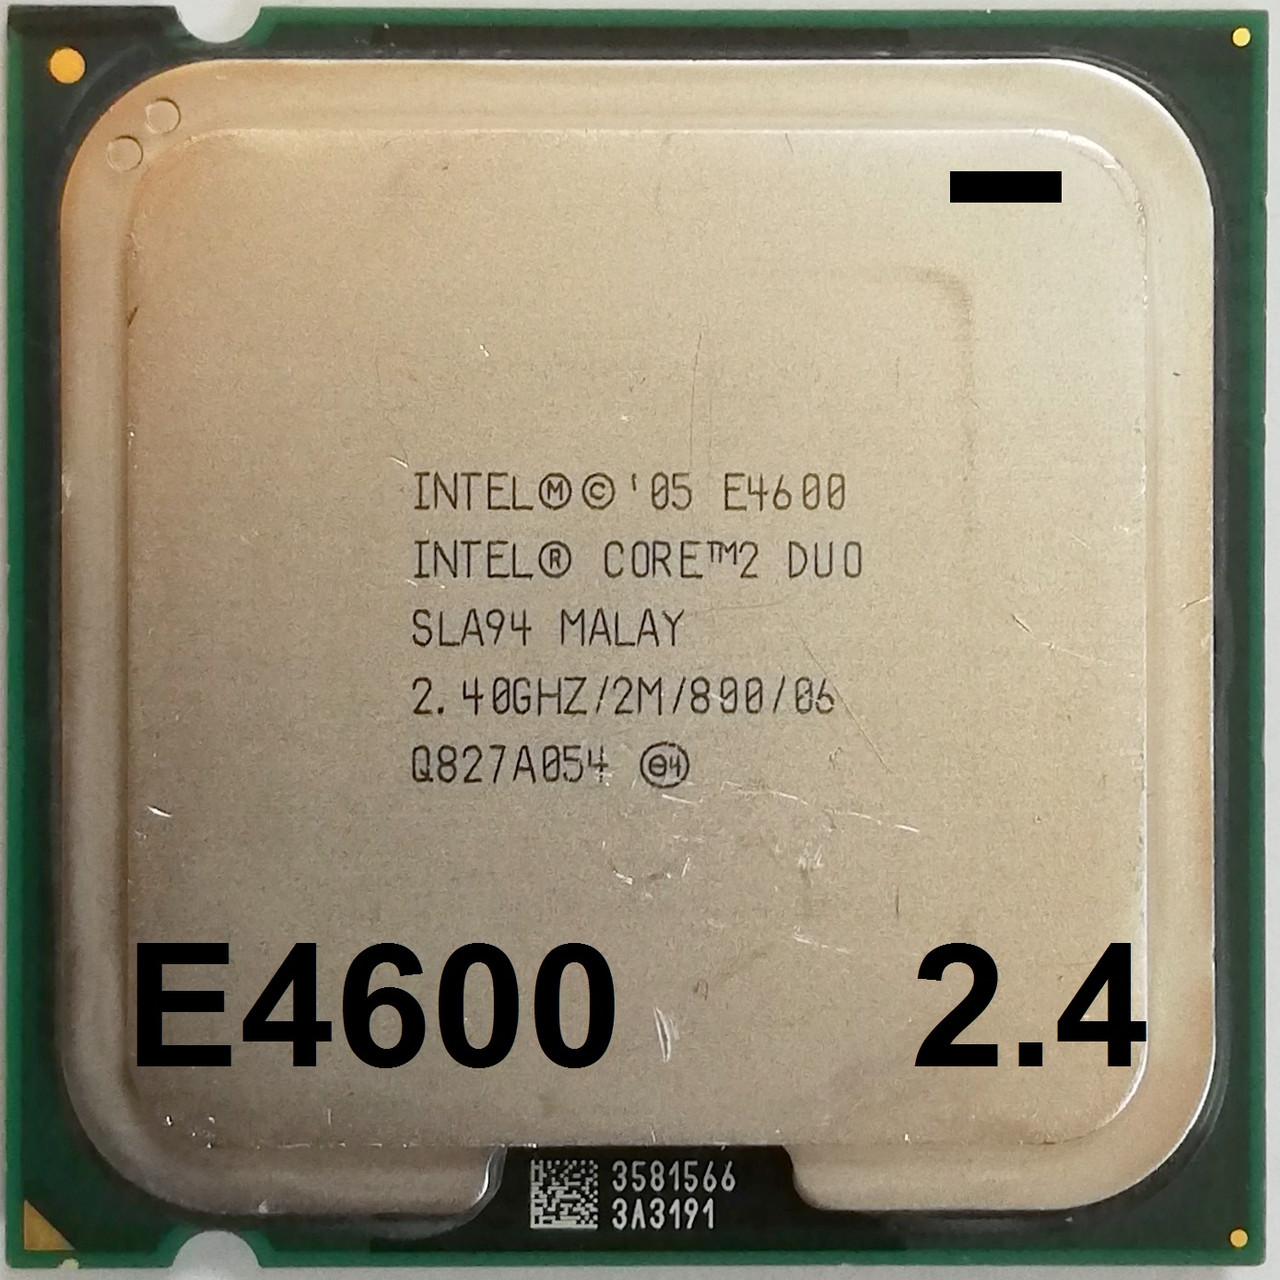 Процессор Intel Core 2 Duo E4600 M0 SLA94 2.40GHz 2M Cache 800 MHz FSB Socket 775 Б/У МИНУС